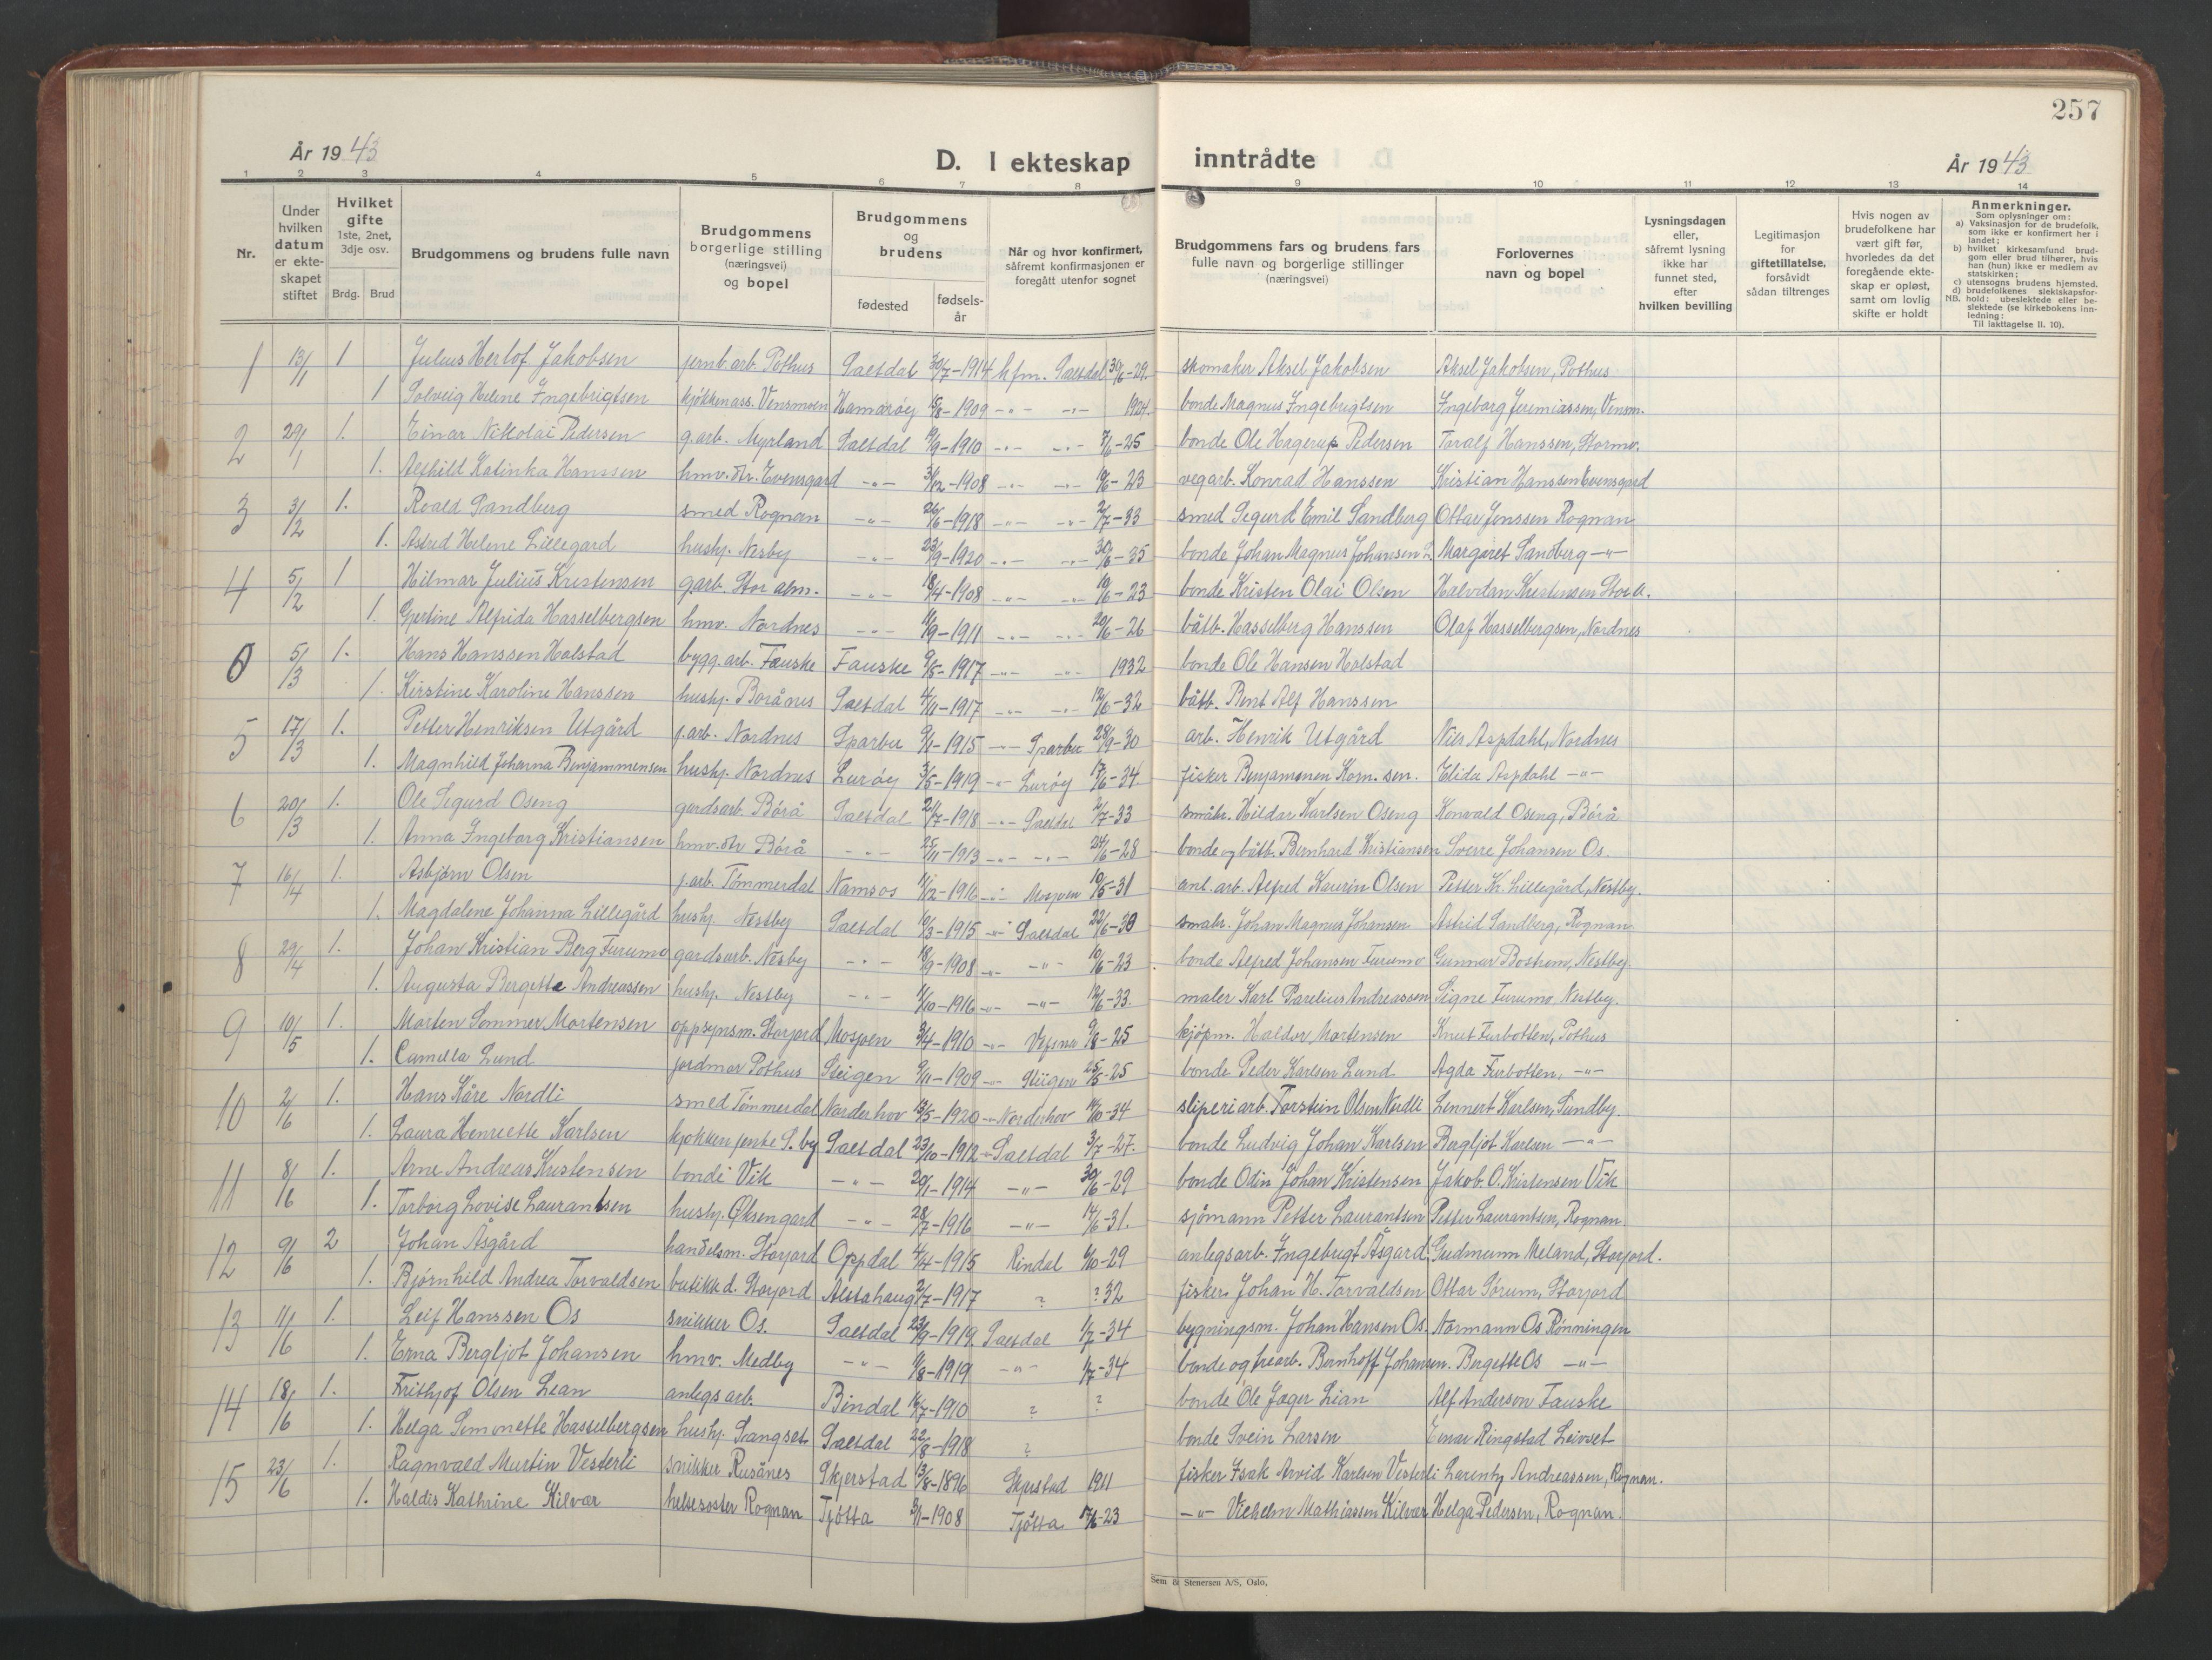 SAT, Ministerialprotokoller, klokkerbøker og fødselsregistre - Nordland, 847/L0680: Klokkerbok nr. 847C08, 1930-1947, s. 257